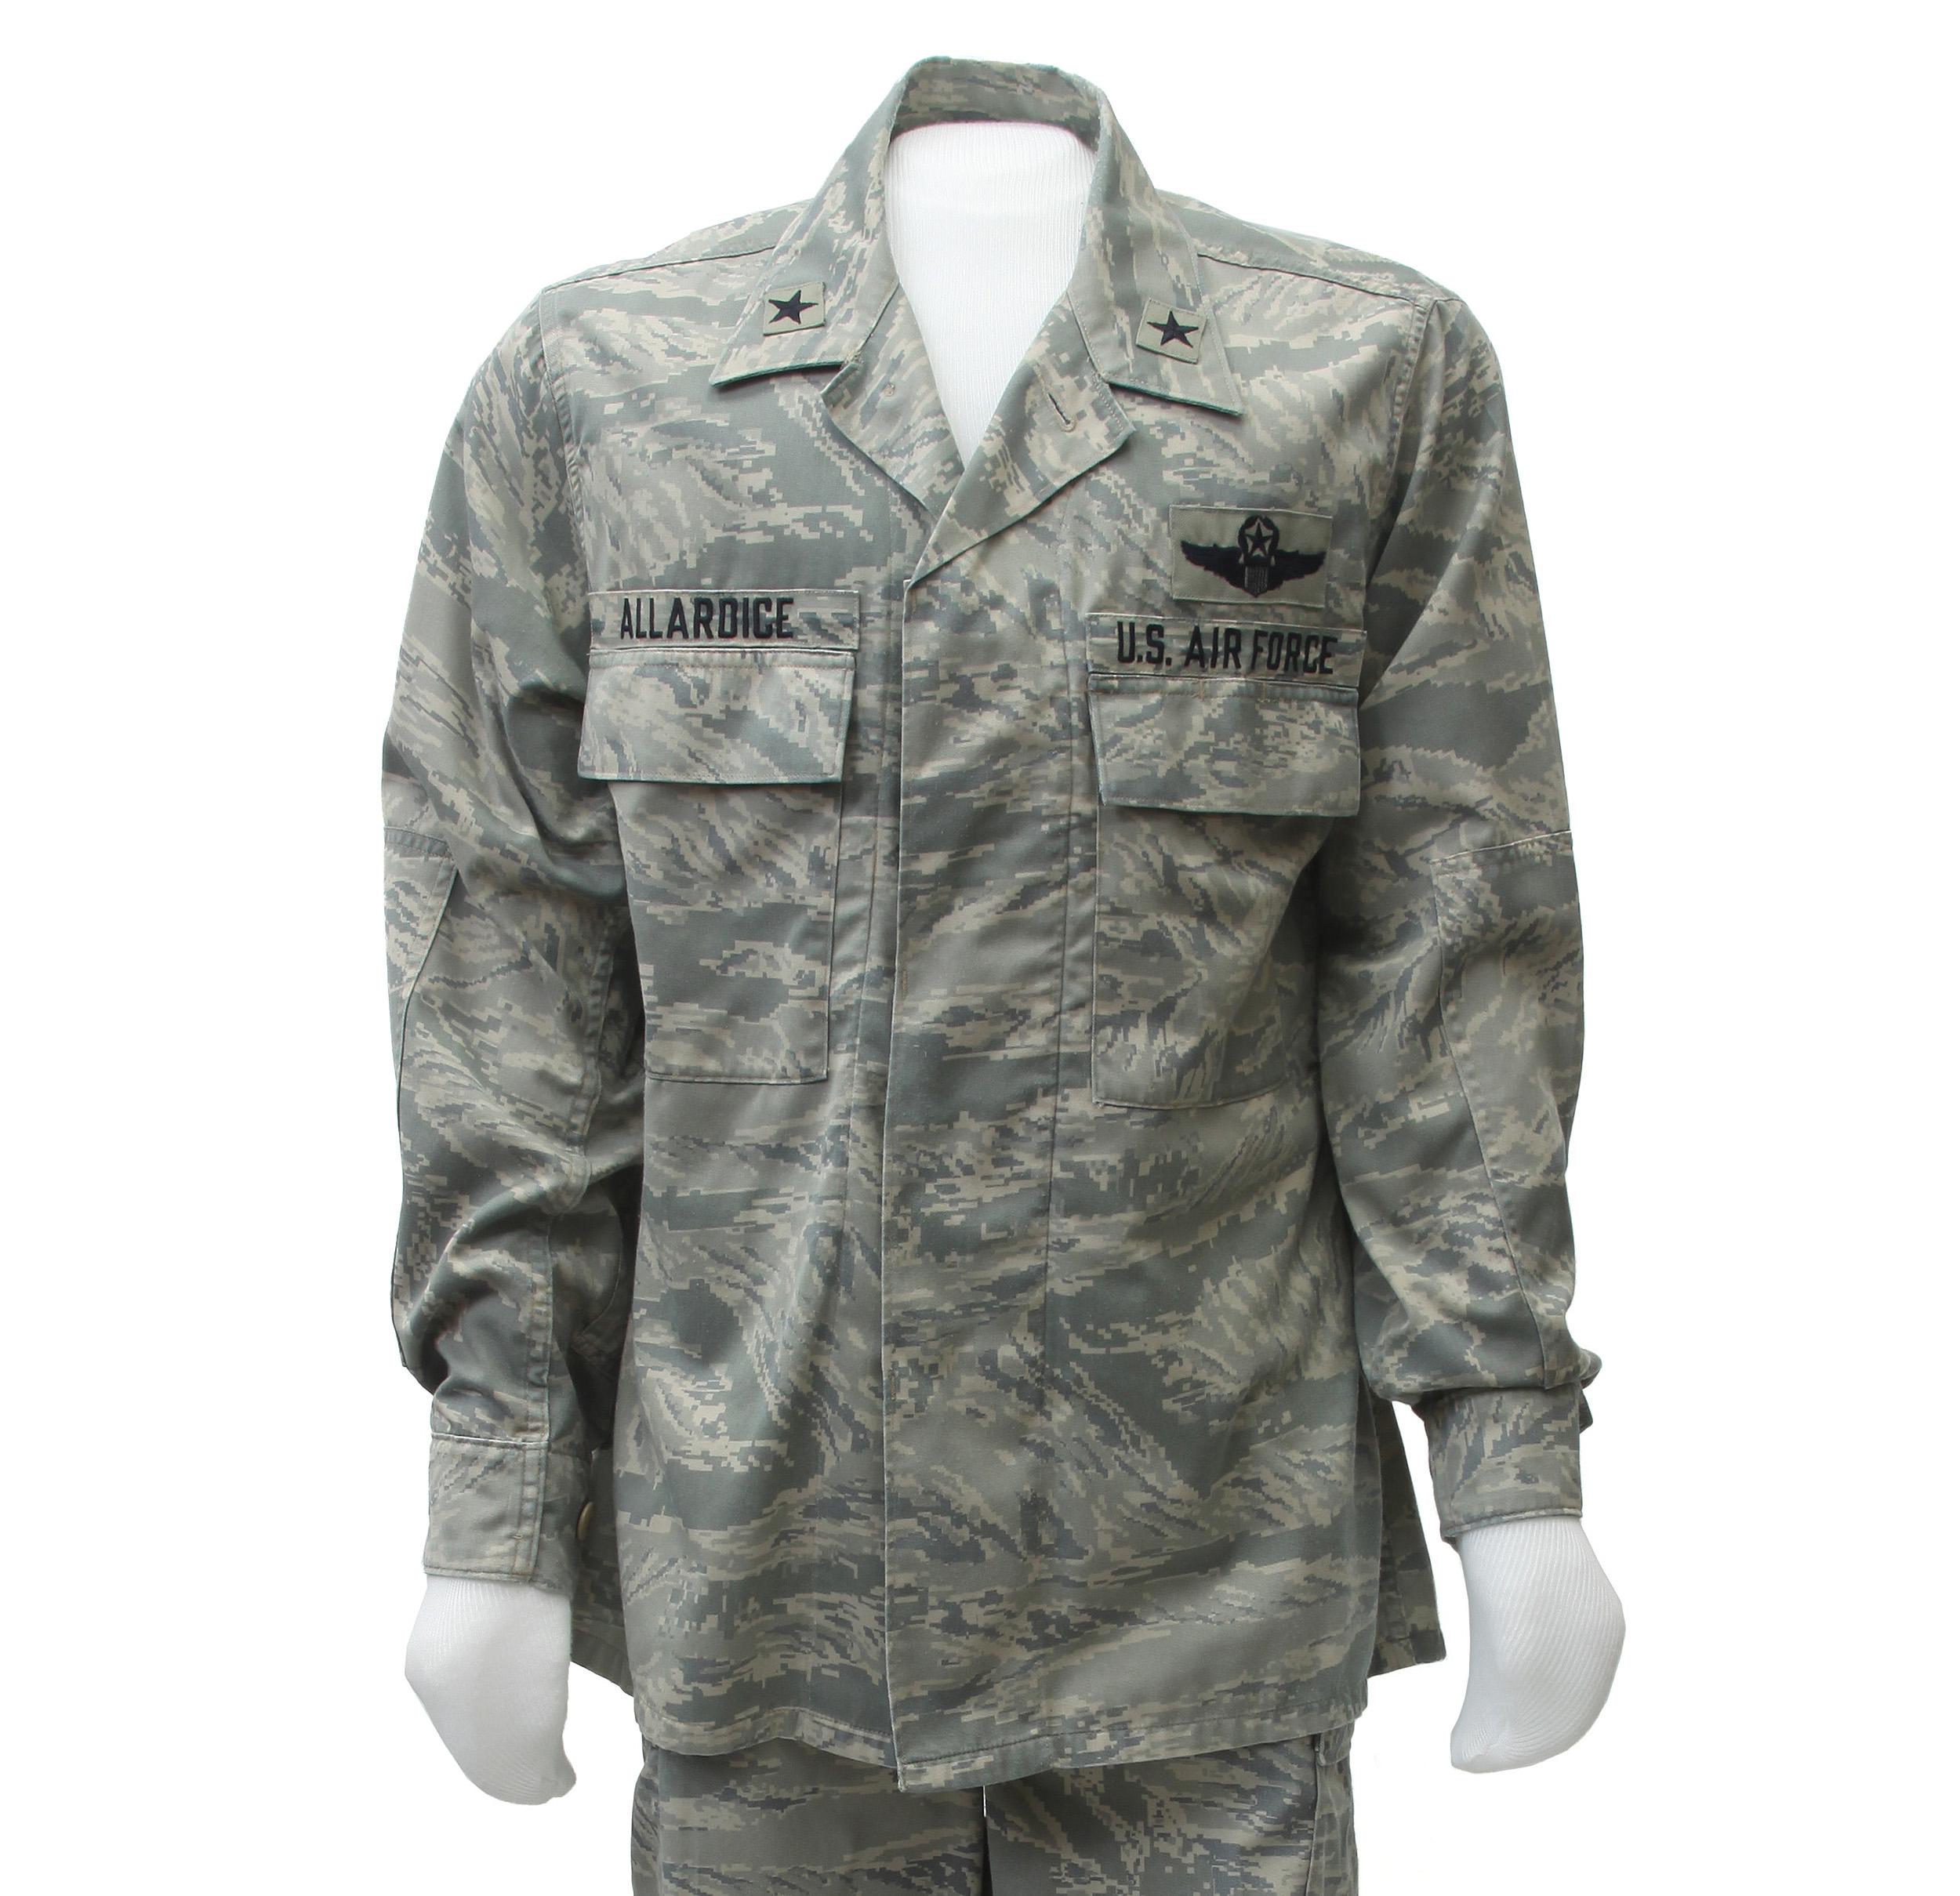 546750f5e24 Experimental Airman Battle Uniform Coat - Air Mobility Command Museum